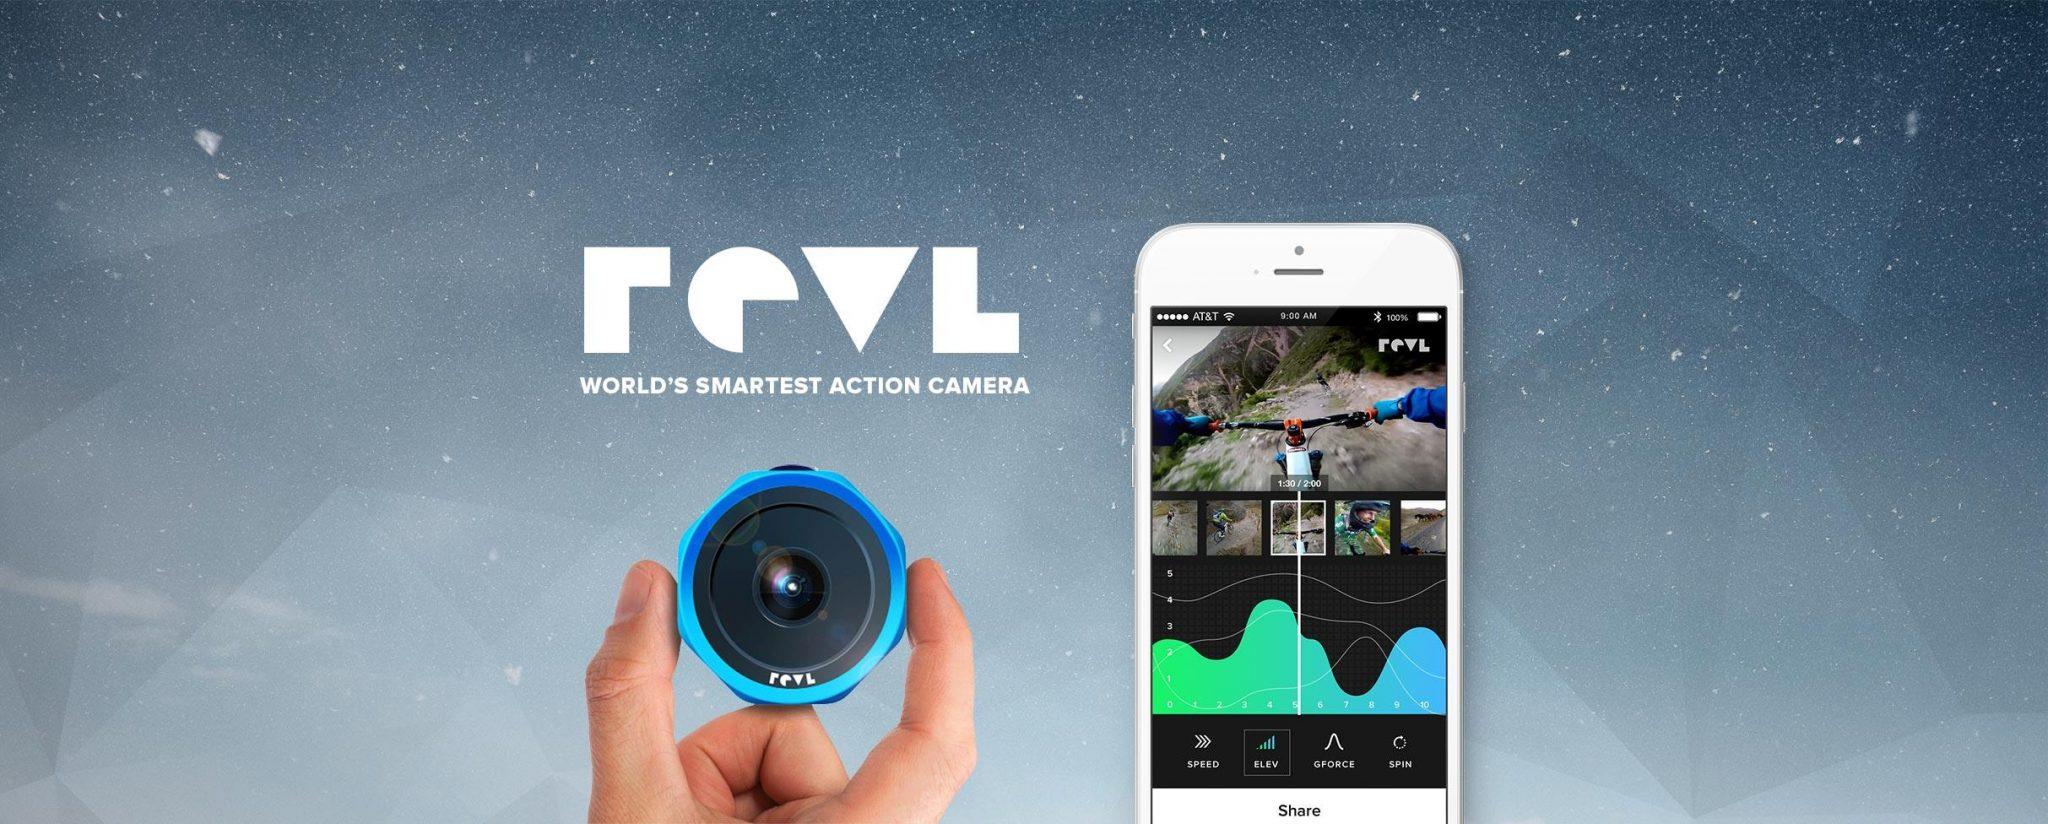 Revl raccoglie 5,2 milioni di dollari grazie all'IA thumbnail